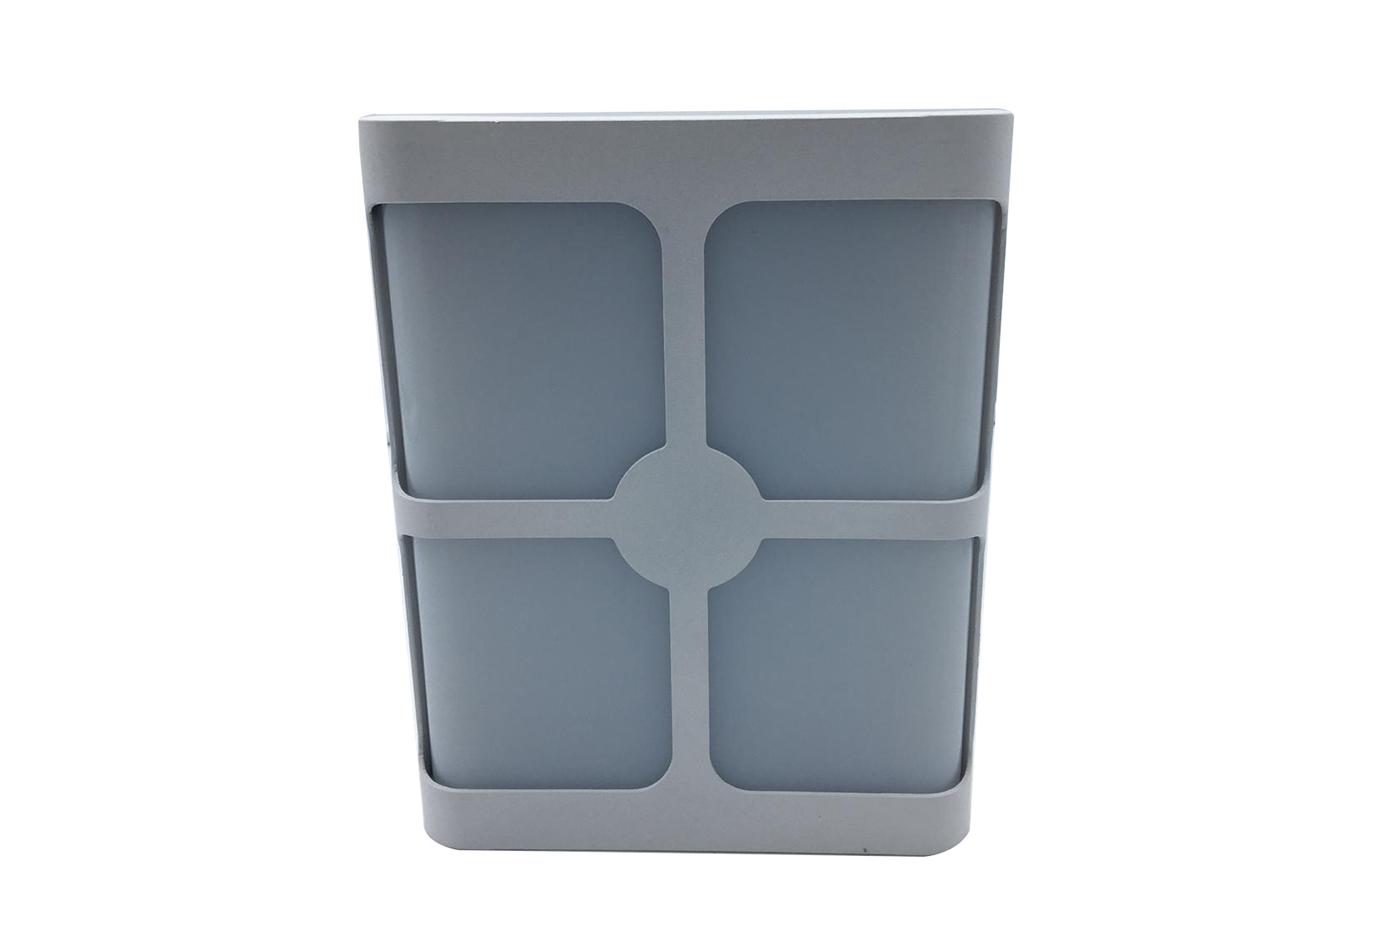 Bes applique beselettronica lampada parete bianco